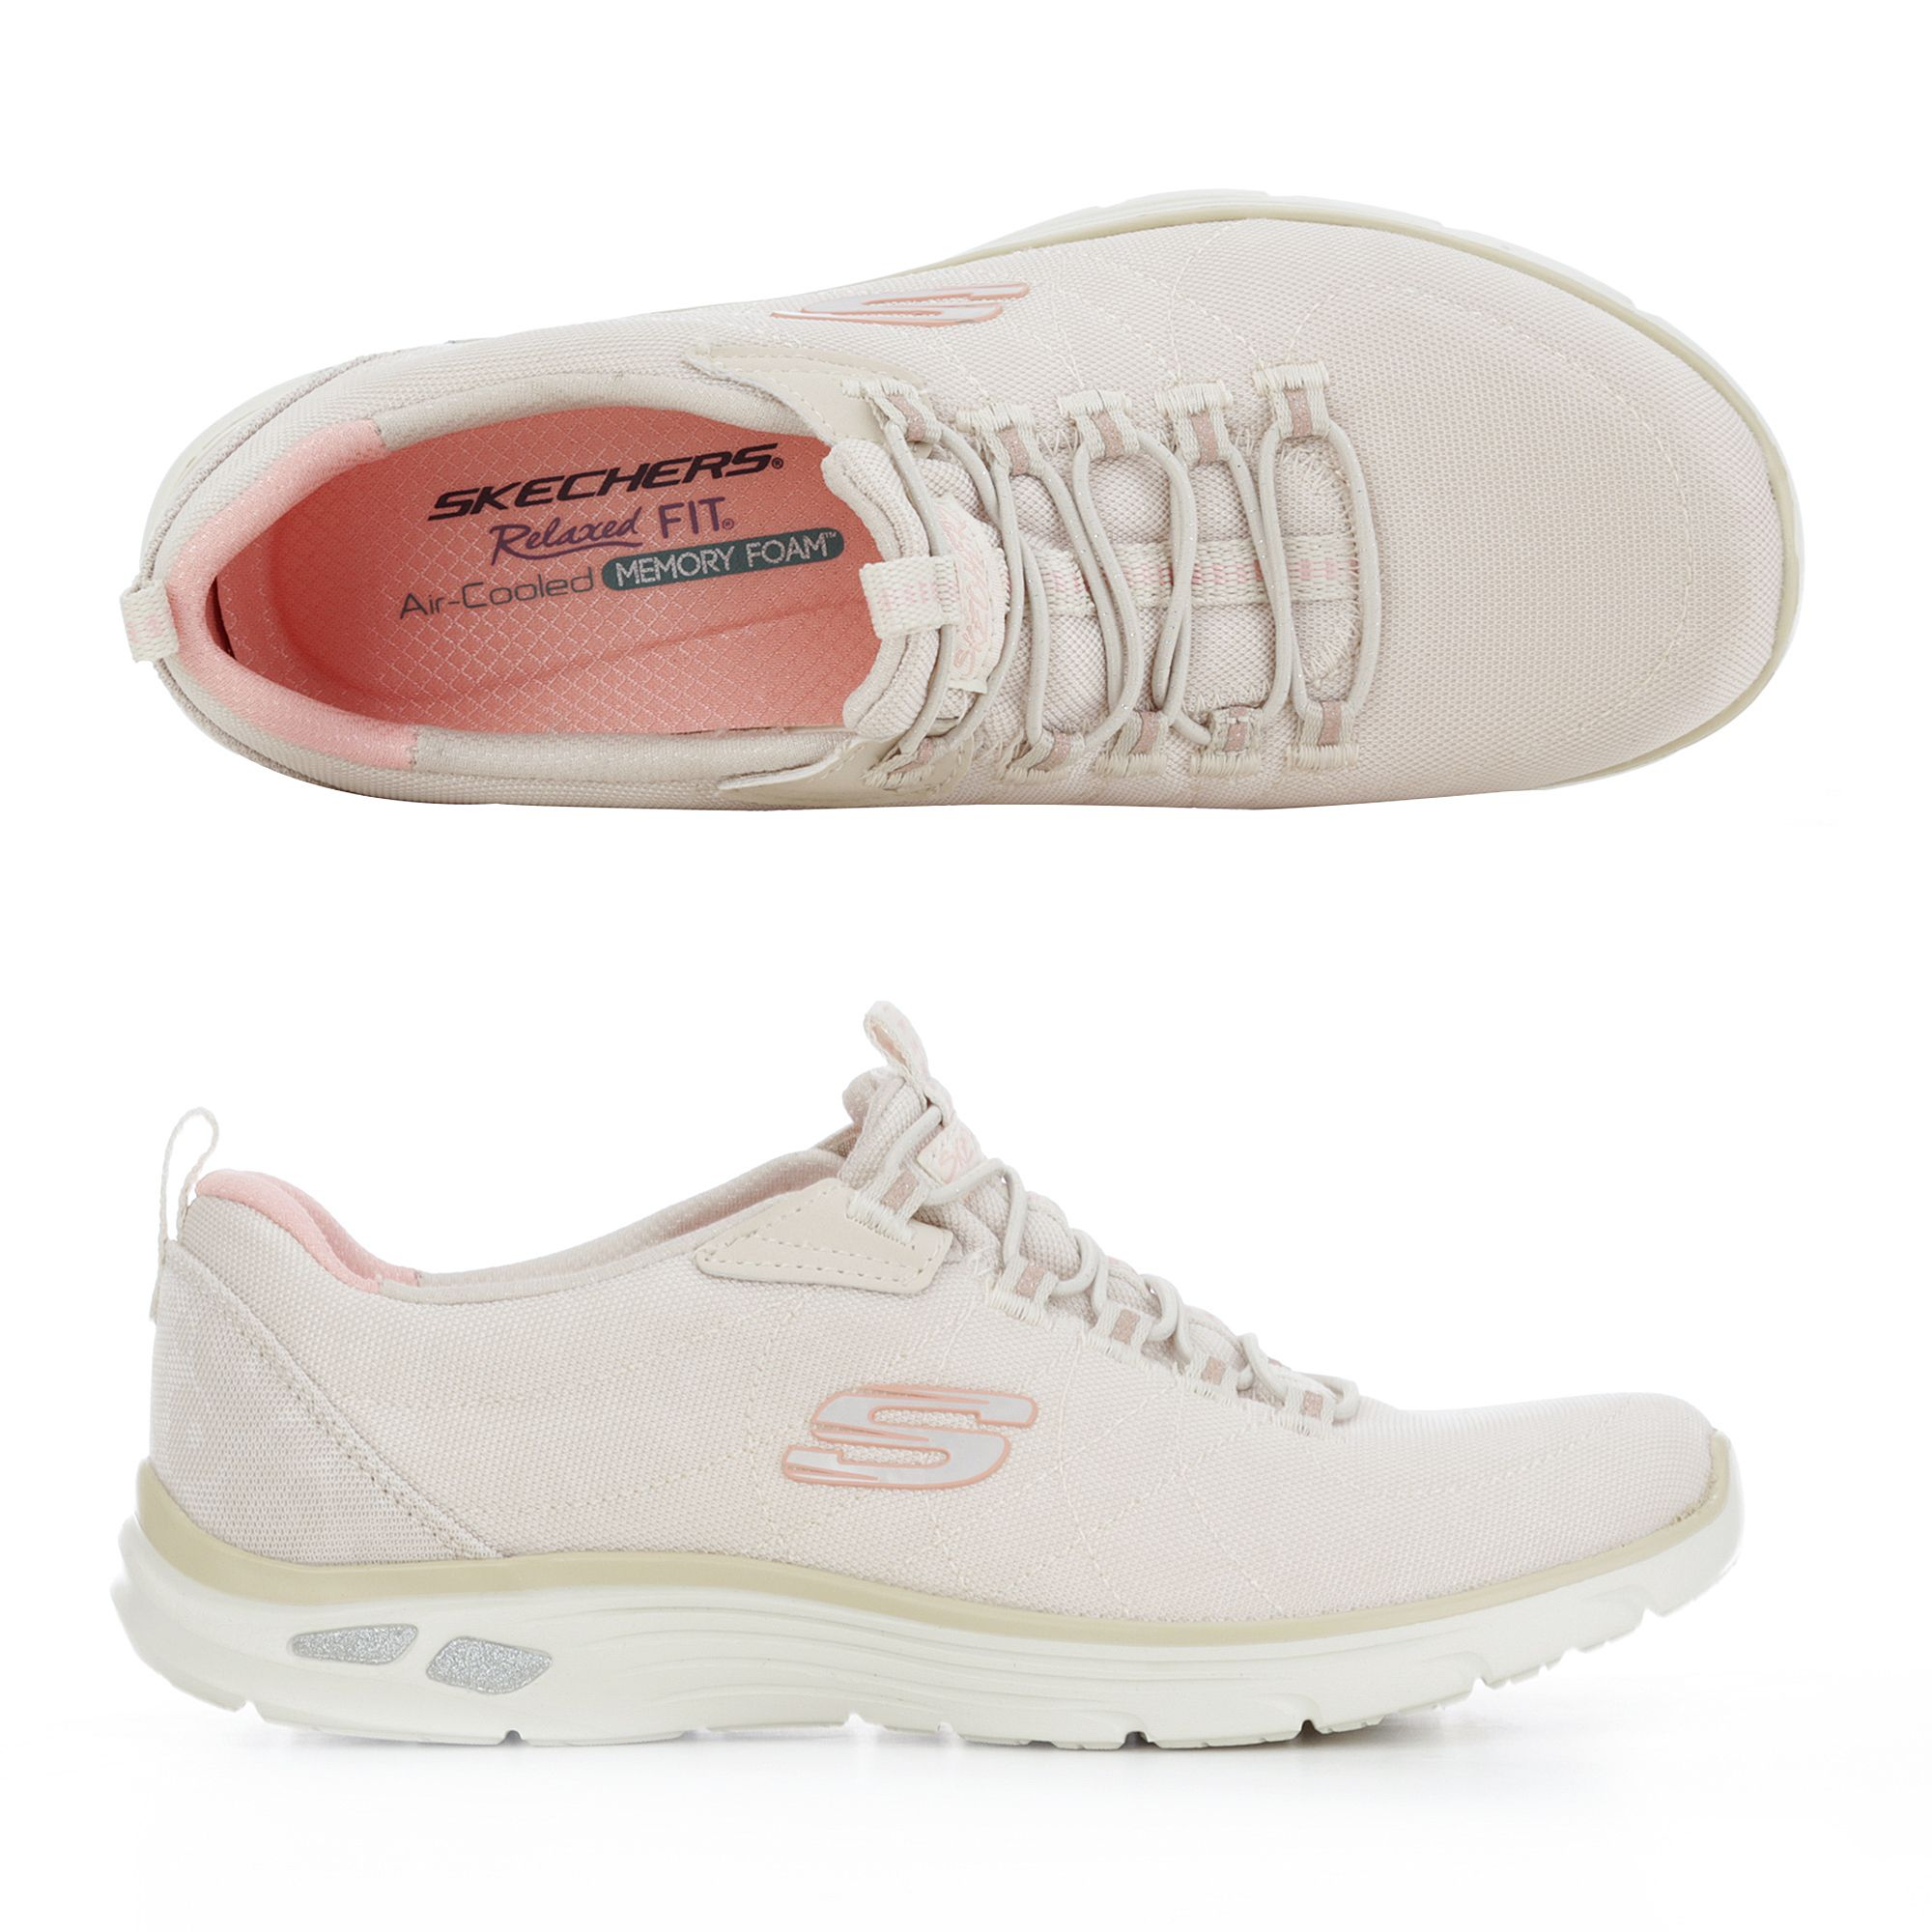 148069eab6 SKECHERS Damen-Sneaker Empire Bungeeschnürung Memory Foam - Page 1 — QVC.de